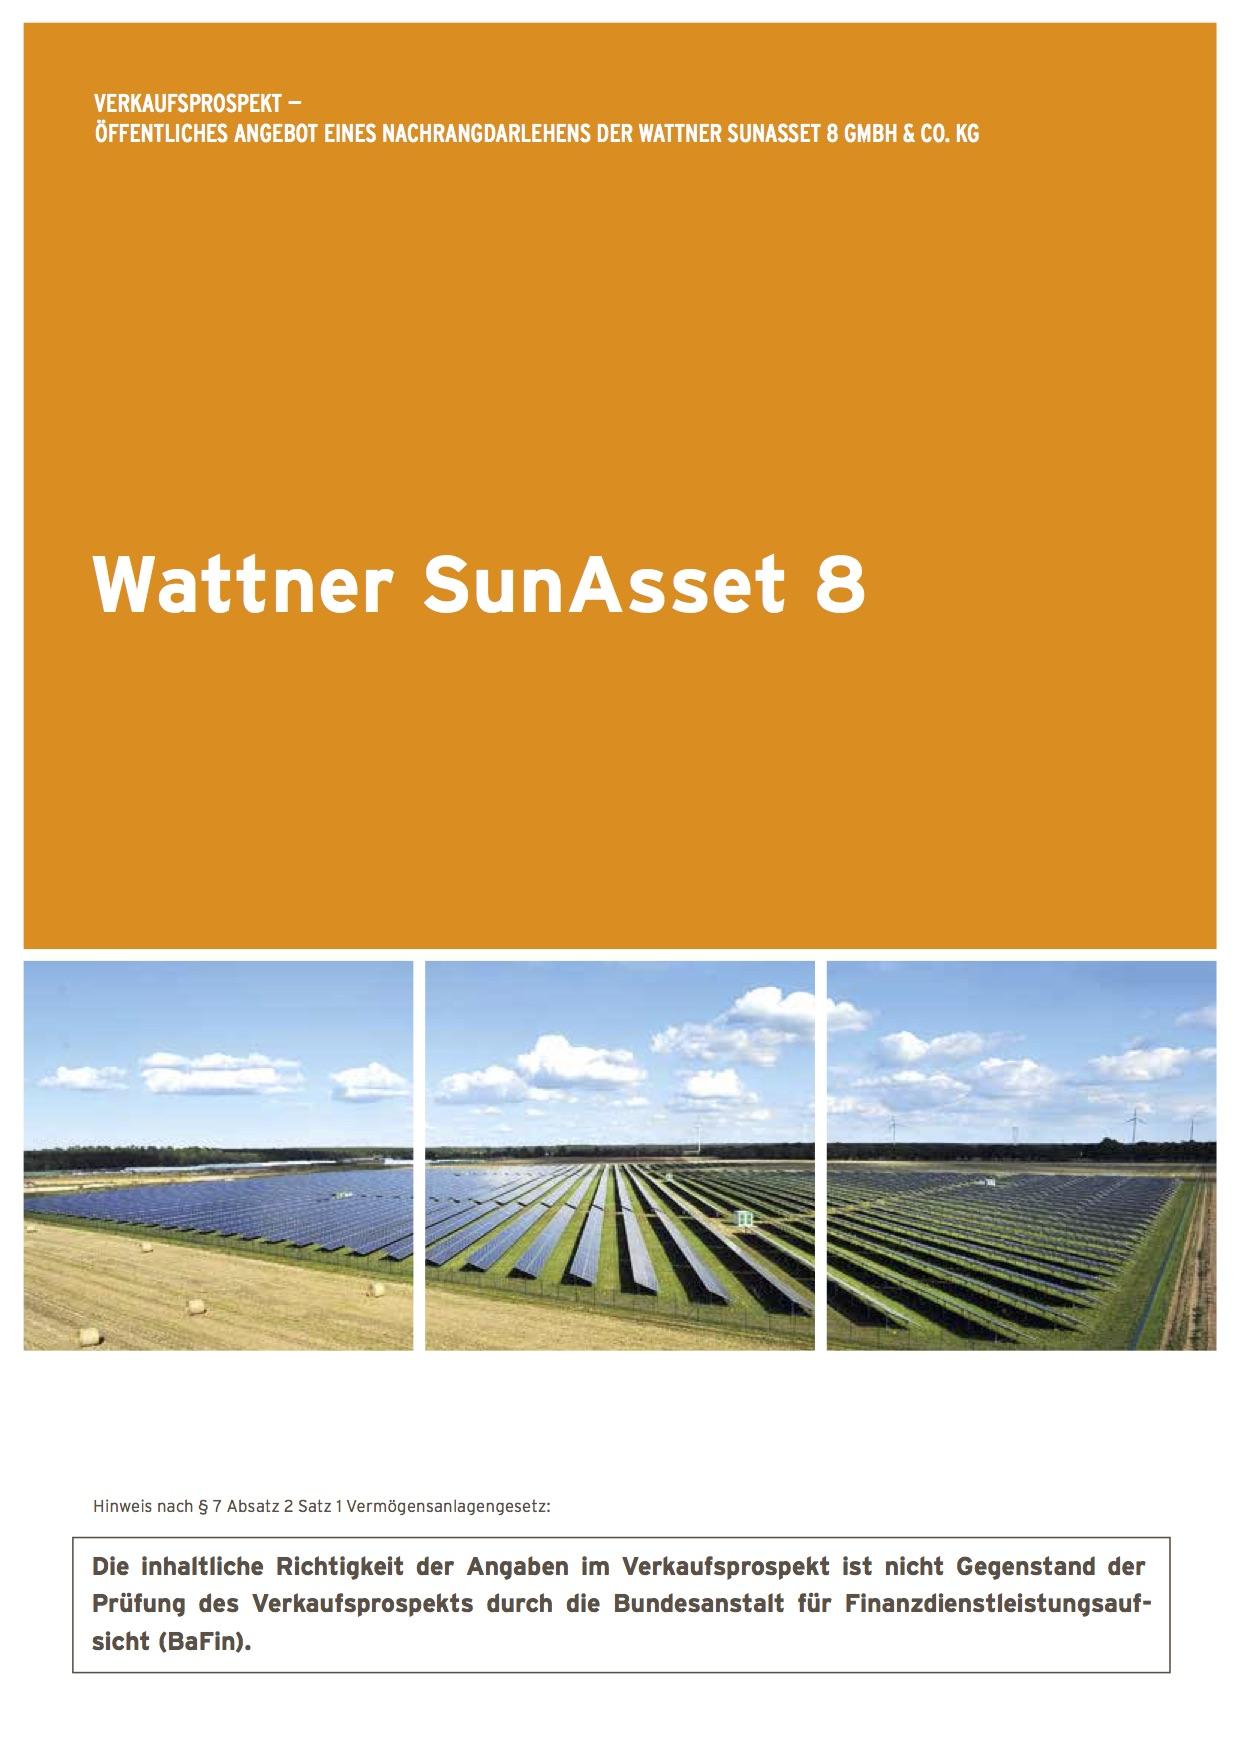 ``Wattner SunAsset 8 Verkaufsprospekt``